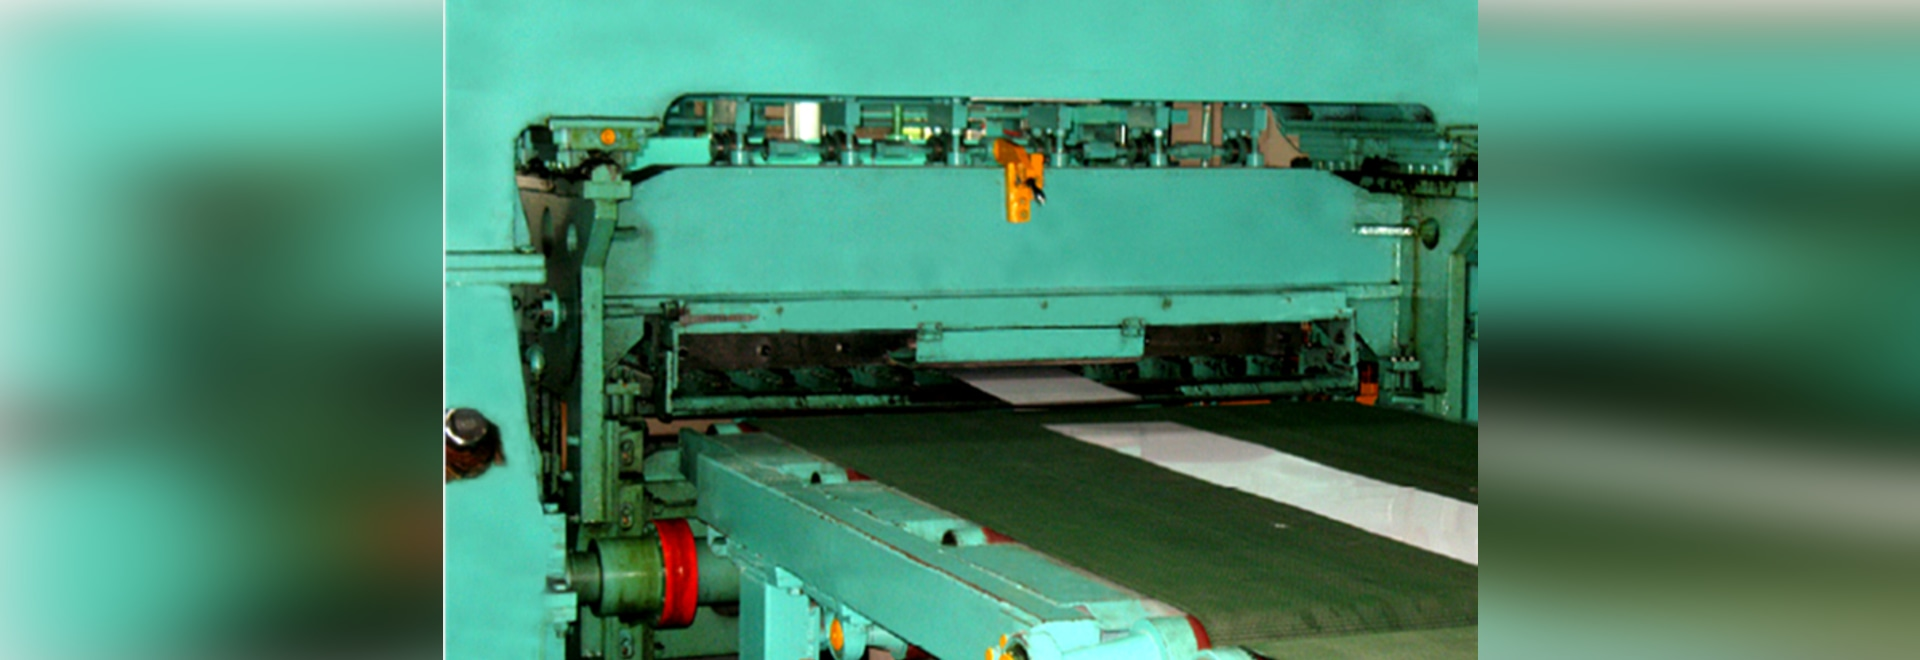 Metal Cutting Process